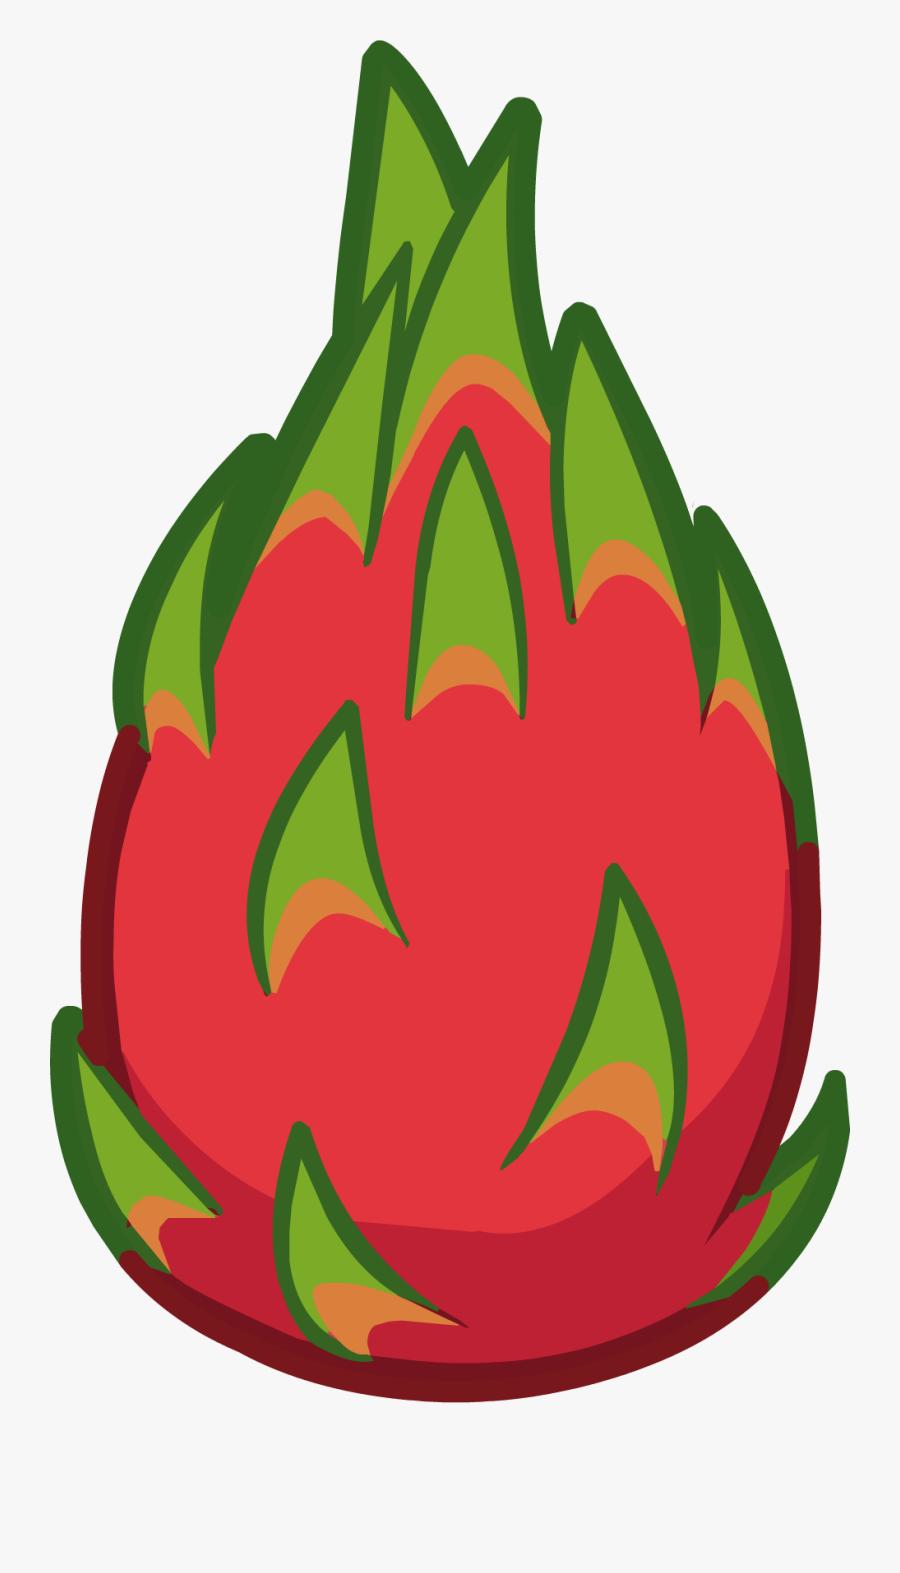 10 Dragon Fruits - Dragon Fruit Icon Png, Transparent Clipart